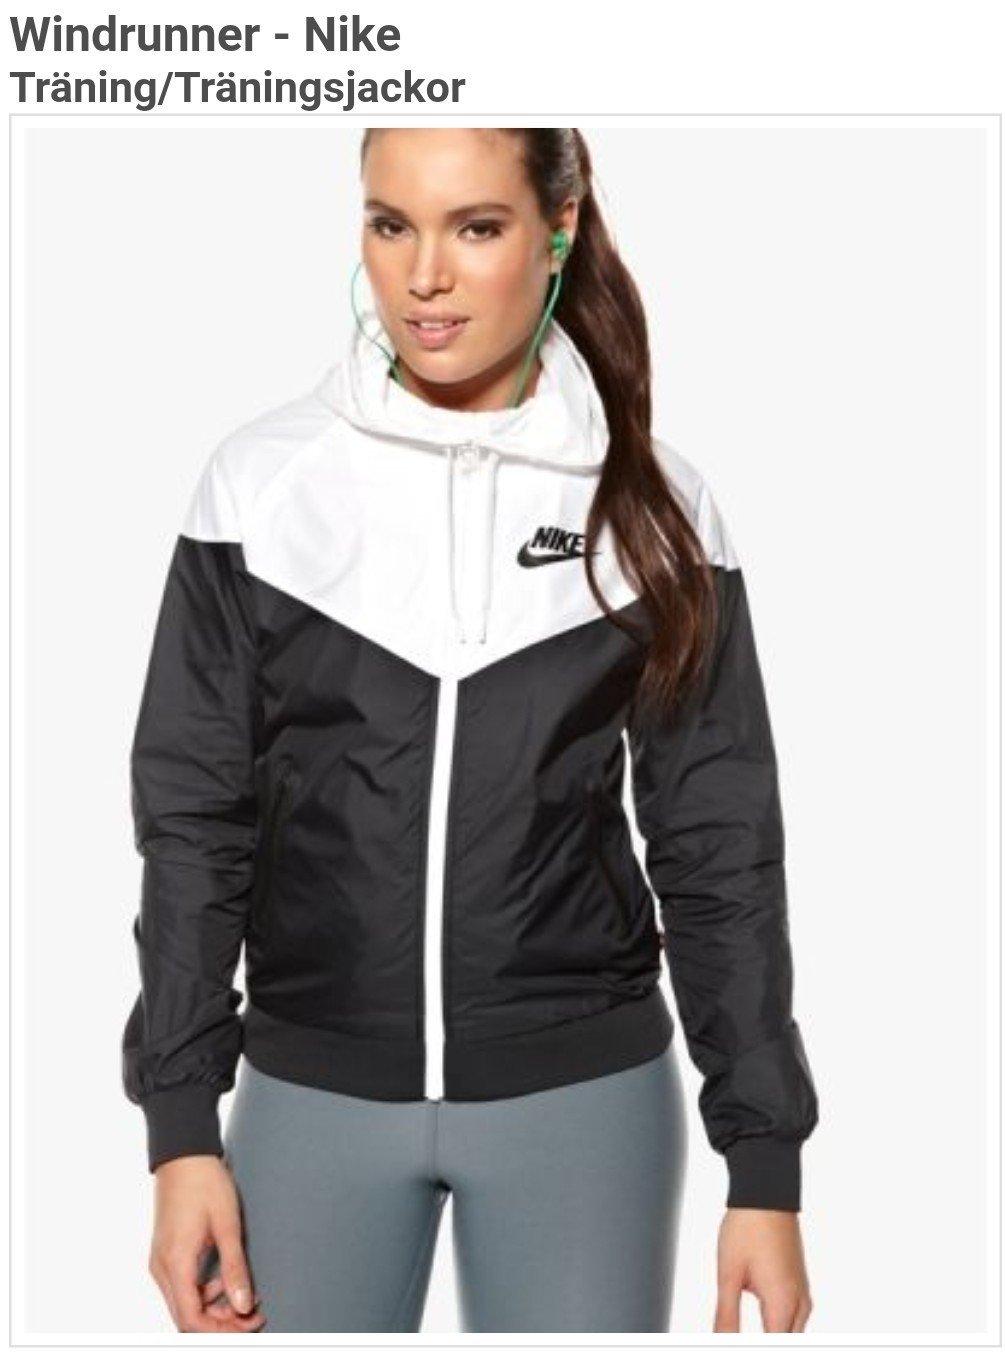 Del Sur Inmigración Matemático  Tränings/vindjacka från Nike (394259878) ᐈ Köp på Tradera